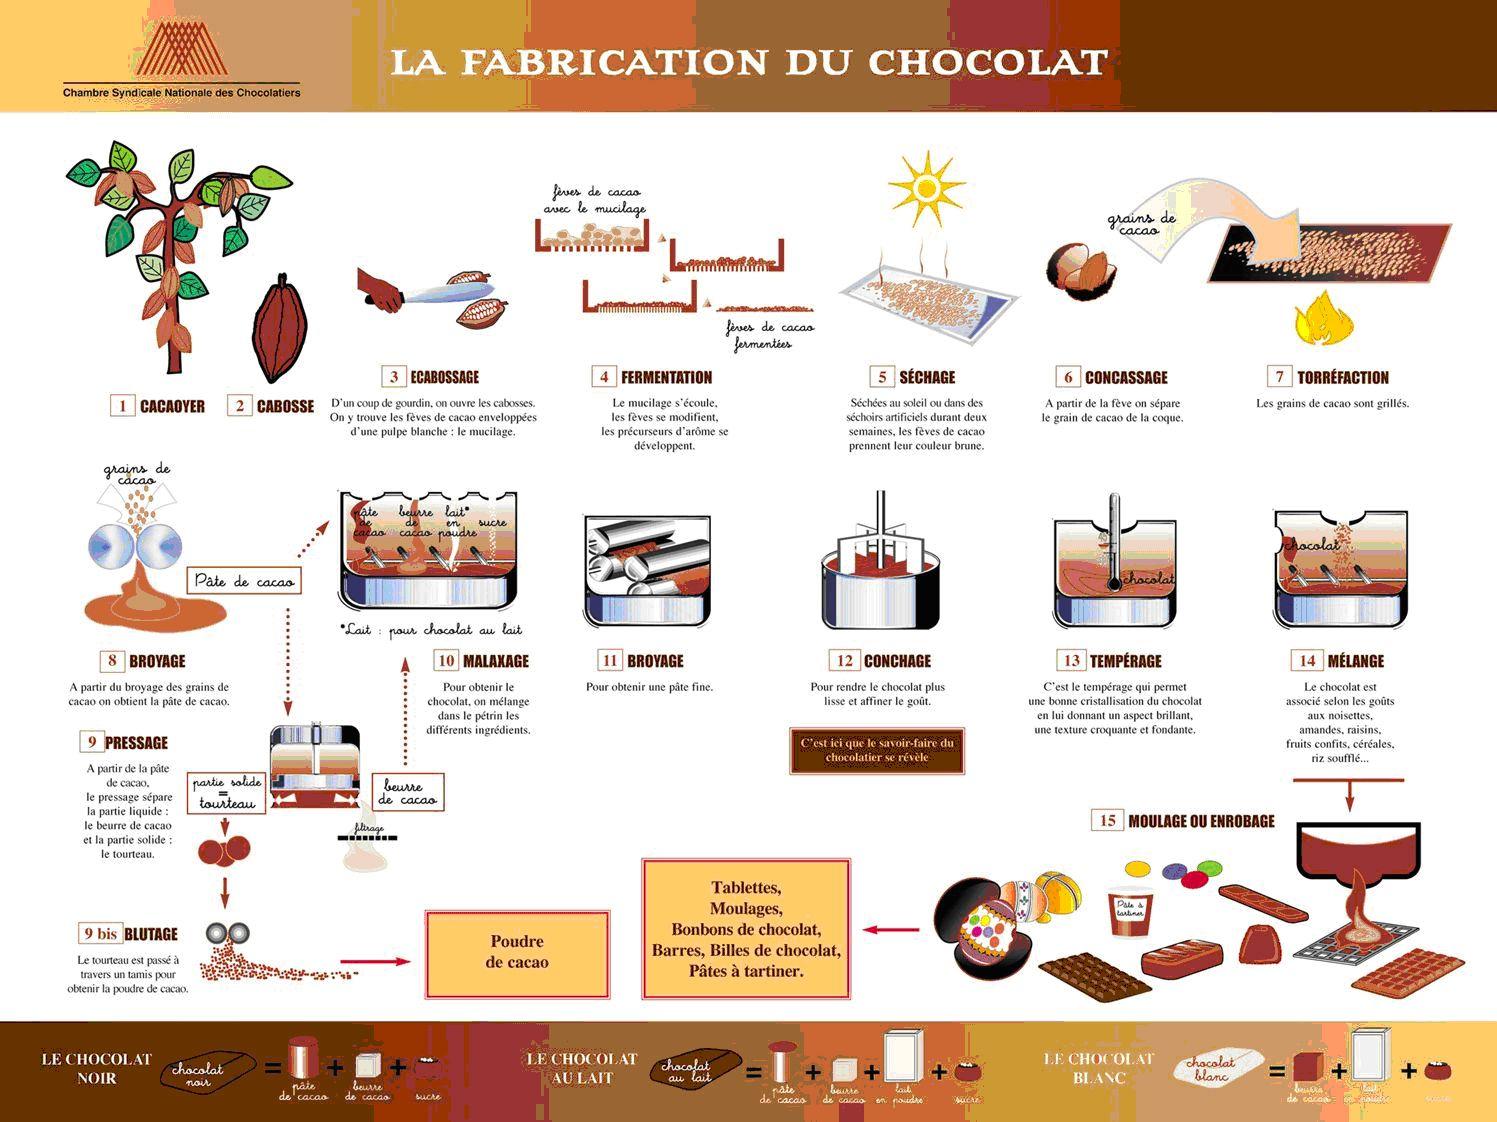 la fabrication du chocolat la lettre table chocolat pinterest fabrication du. Black Bedroom Furniture Sets. Home Design Ideas